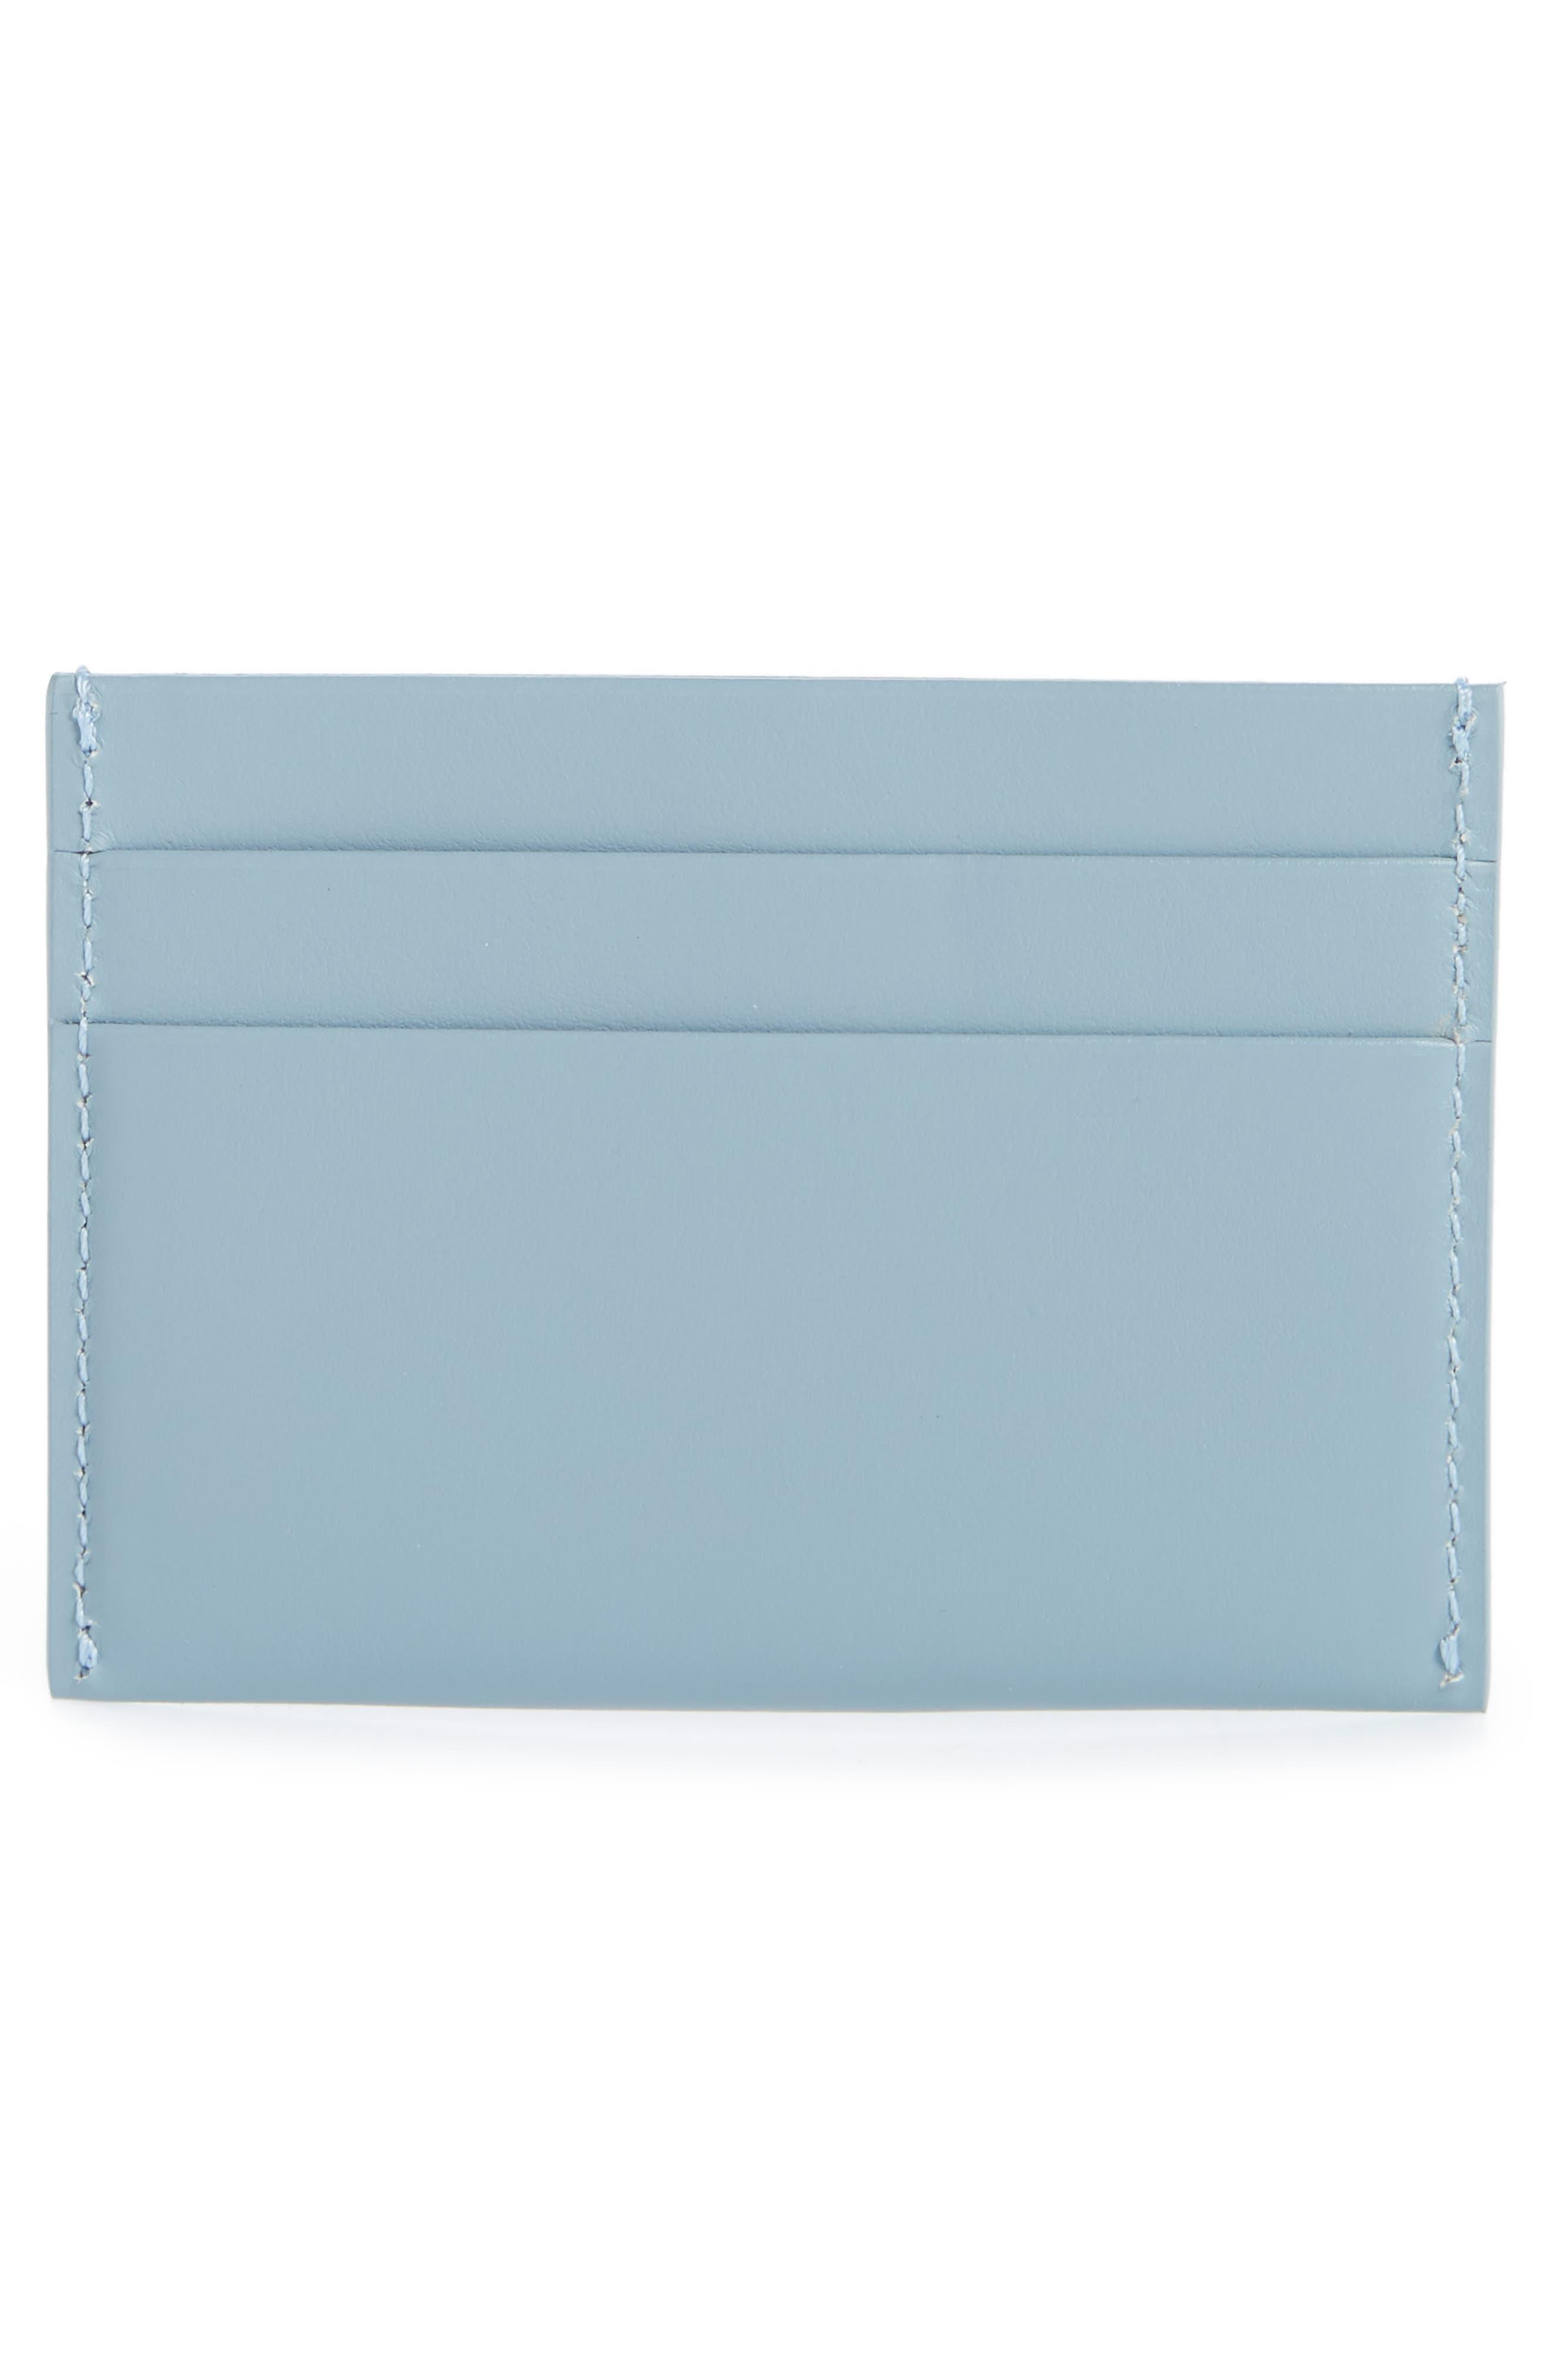 Leather Card Holder,                             Alternate thumbnail 2, color,                             GREY BLUE